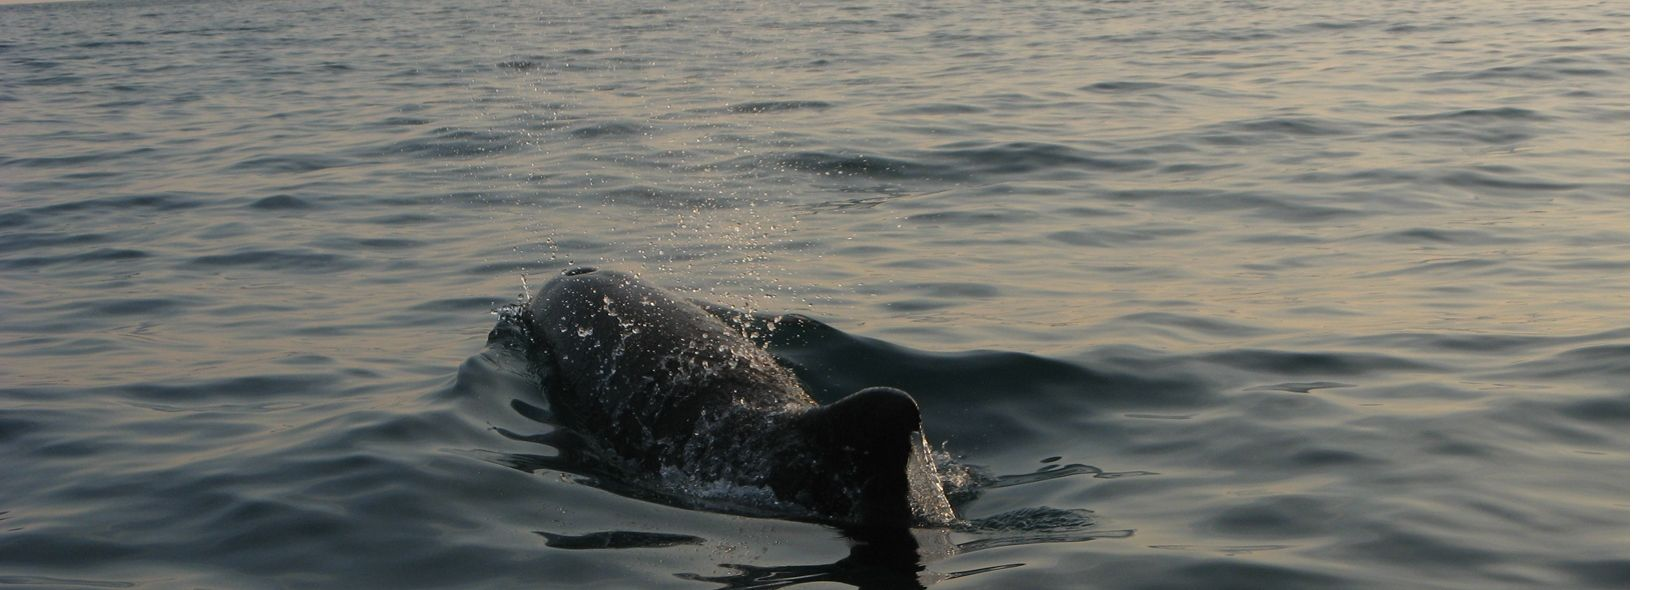 Avvistamento cetacei: globicefalo - foto: Daniela Corriga